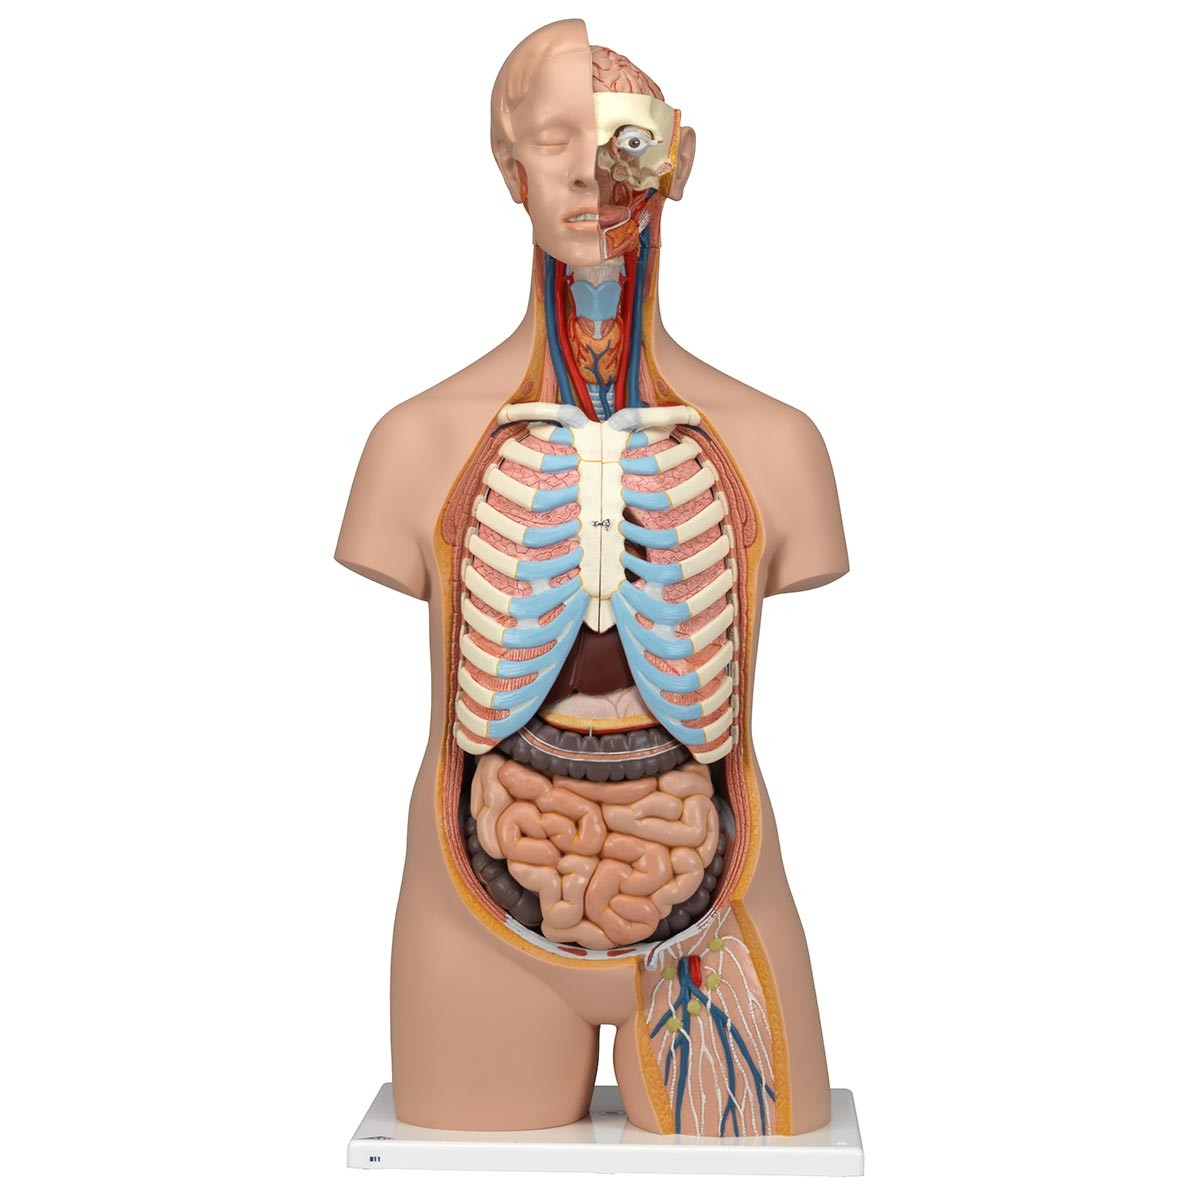 Famoso Human Anatomy Doll Adorno Anatoma De Las Imgenesdel